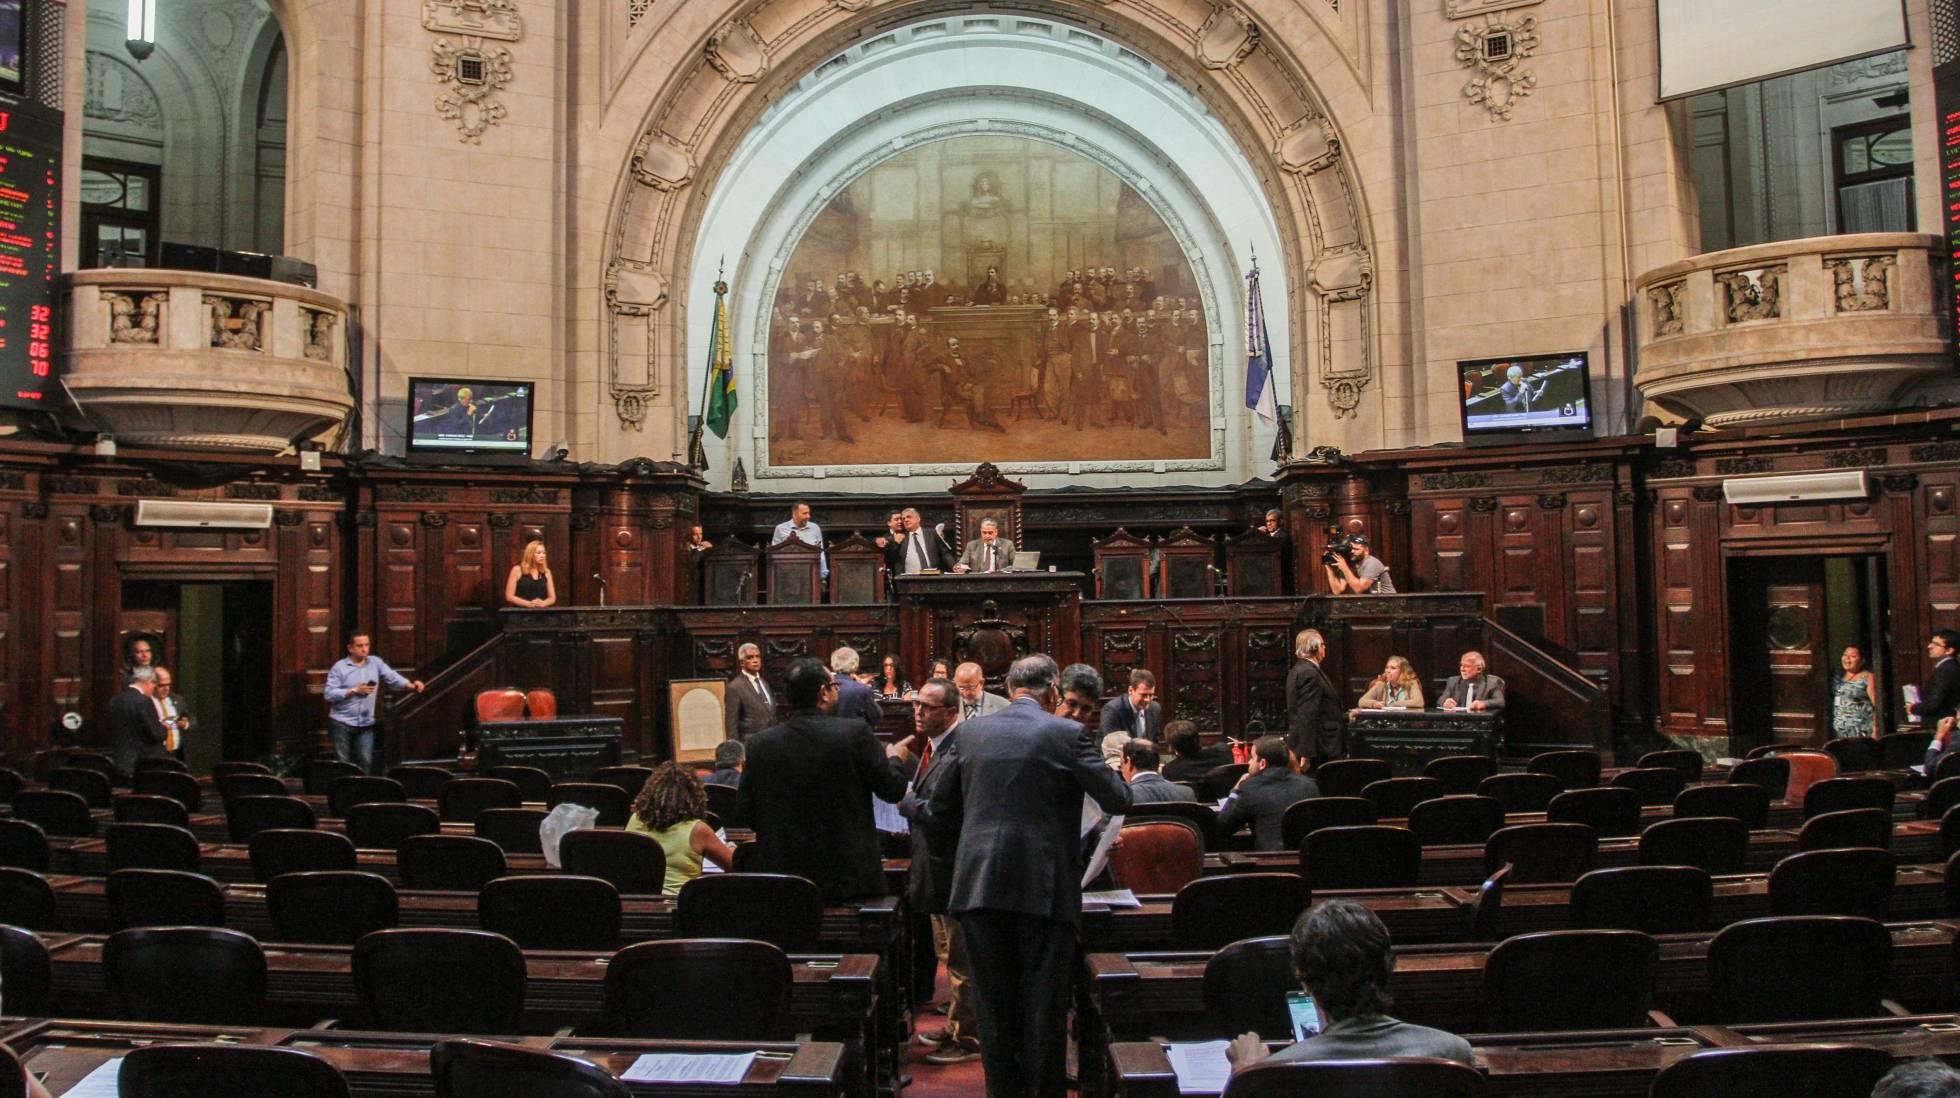 [Imagem: 1544720844_126366_1544794750_noticia_nor...corte1.jpg]